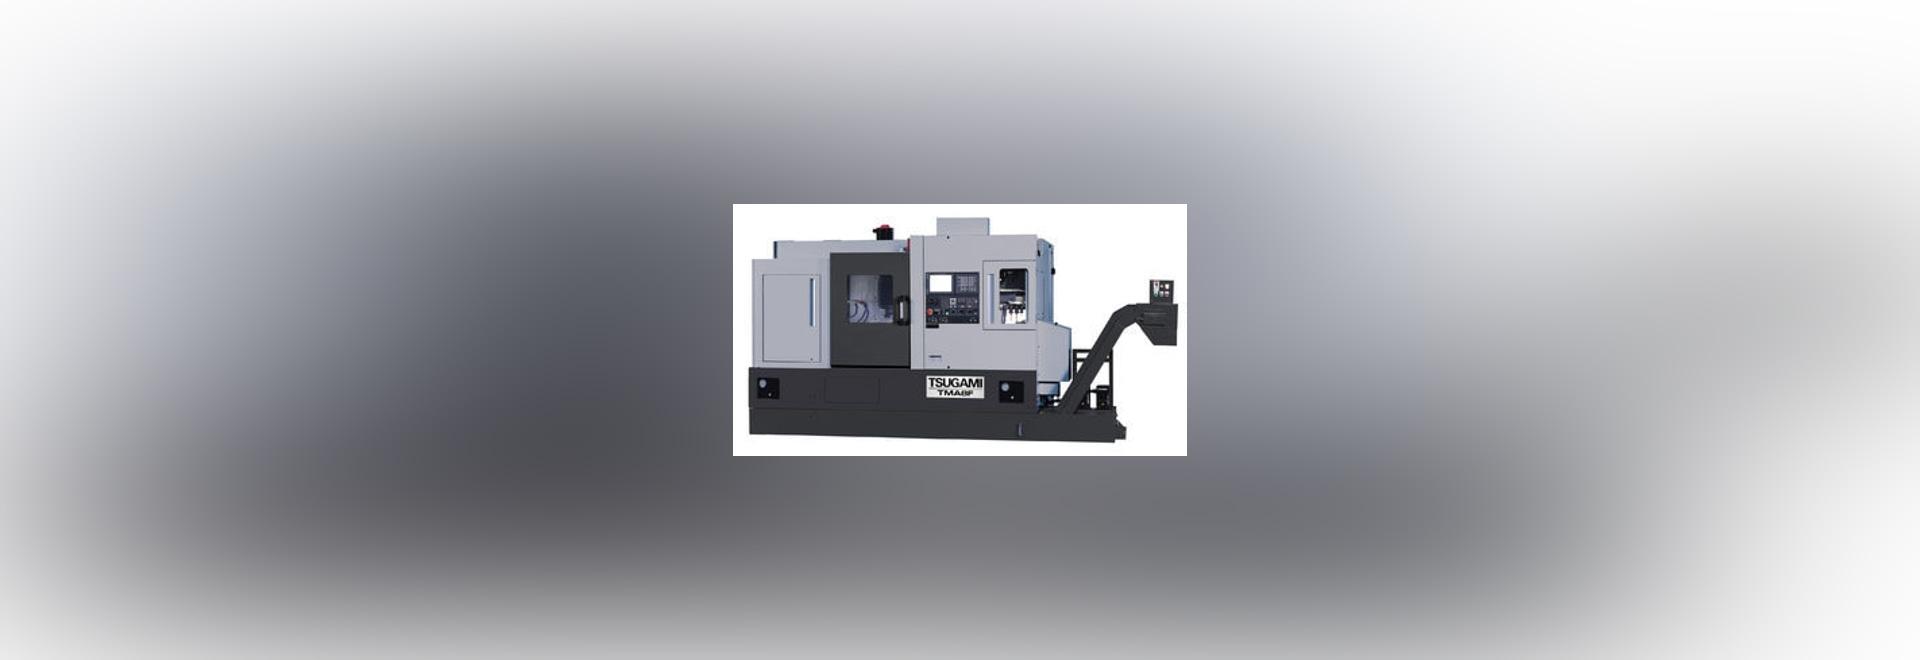 NEW: CNC turning center by Tsugami